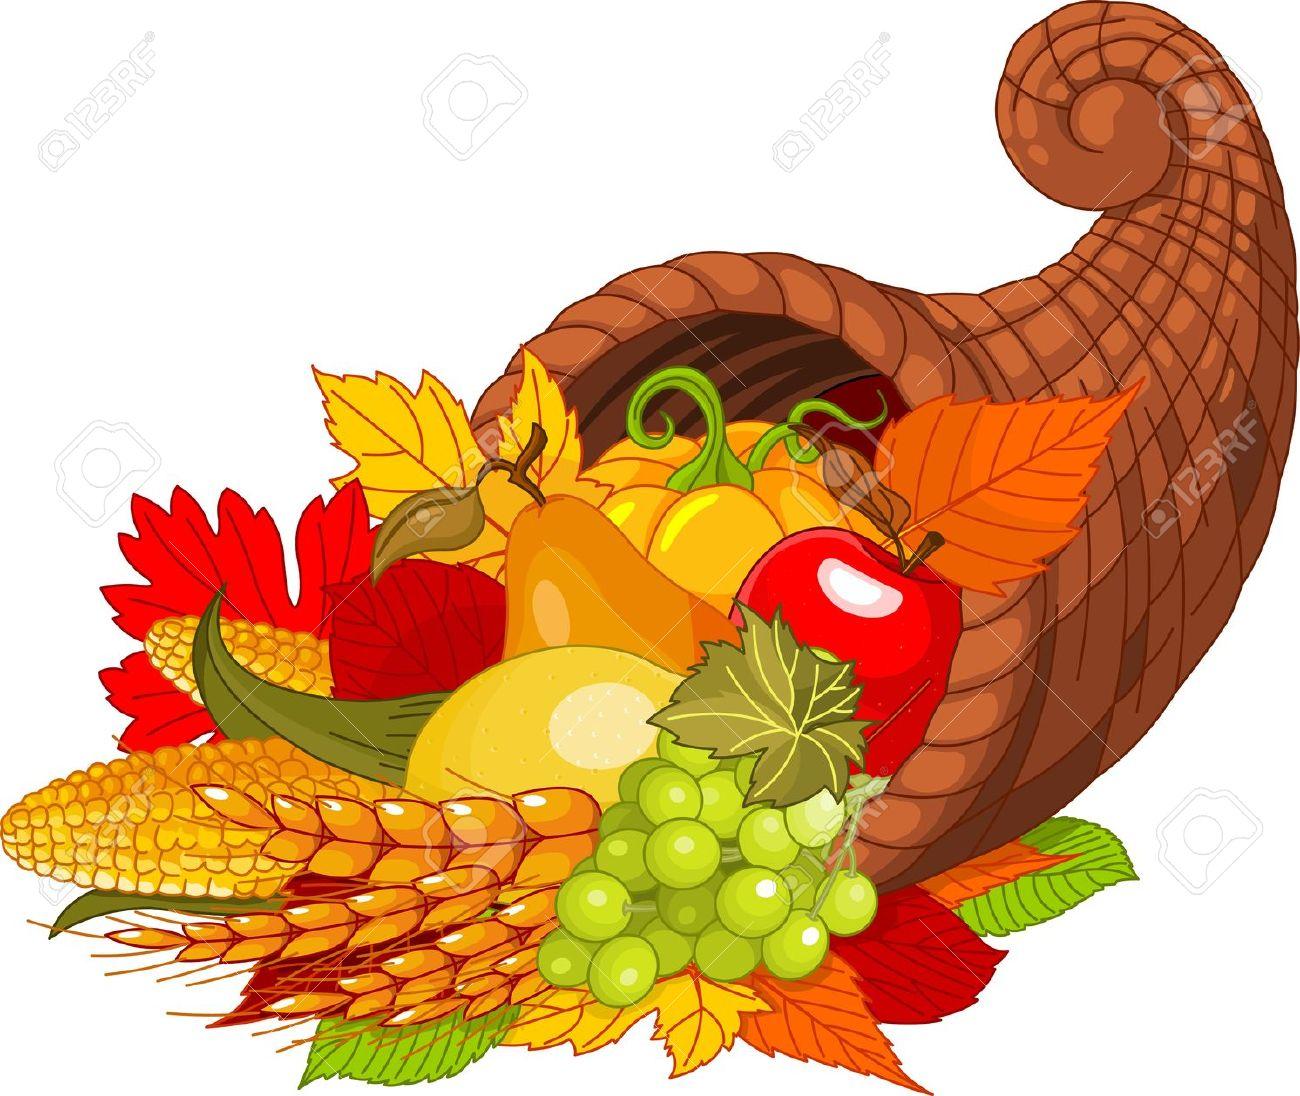 Autumn harvest clipart - Clipground